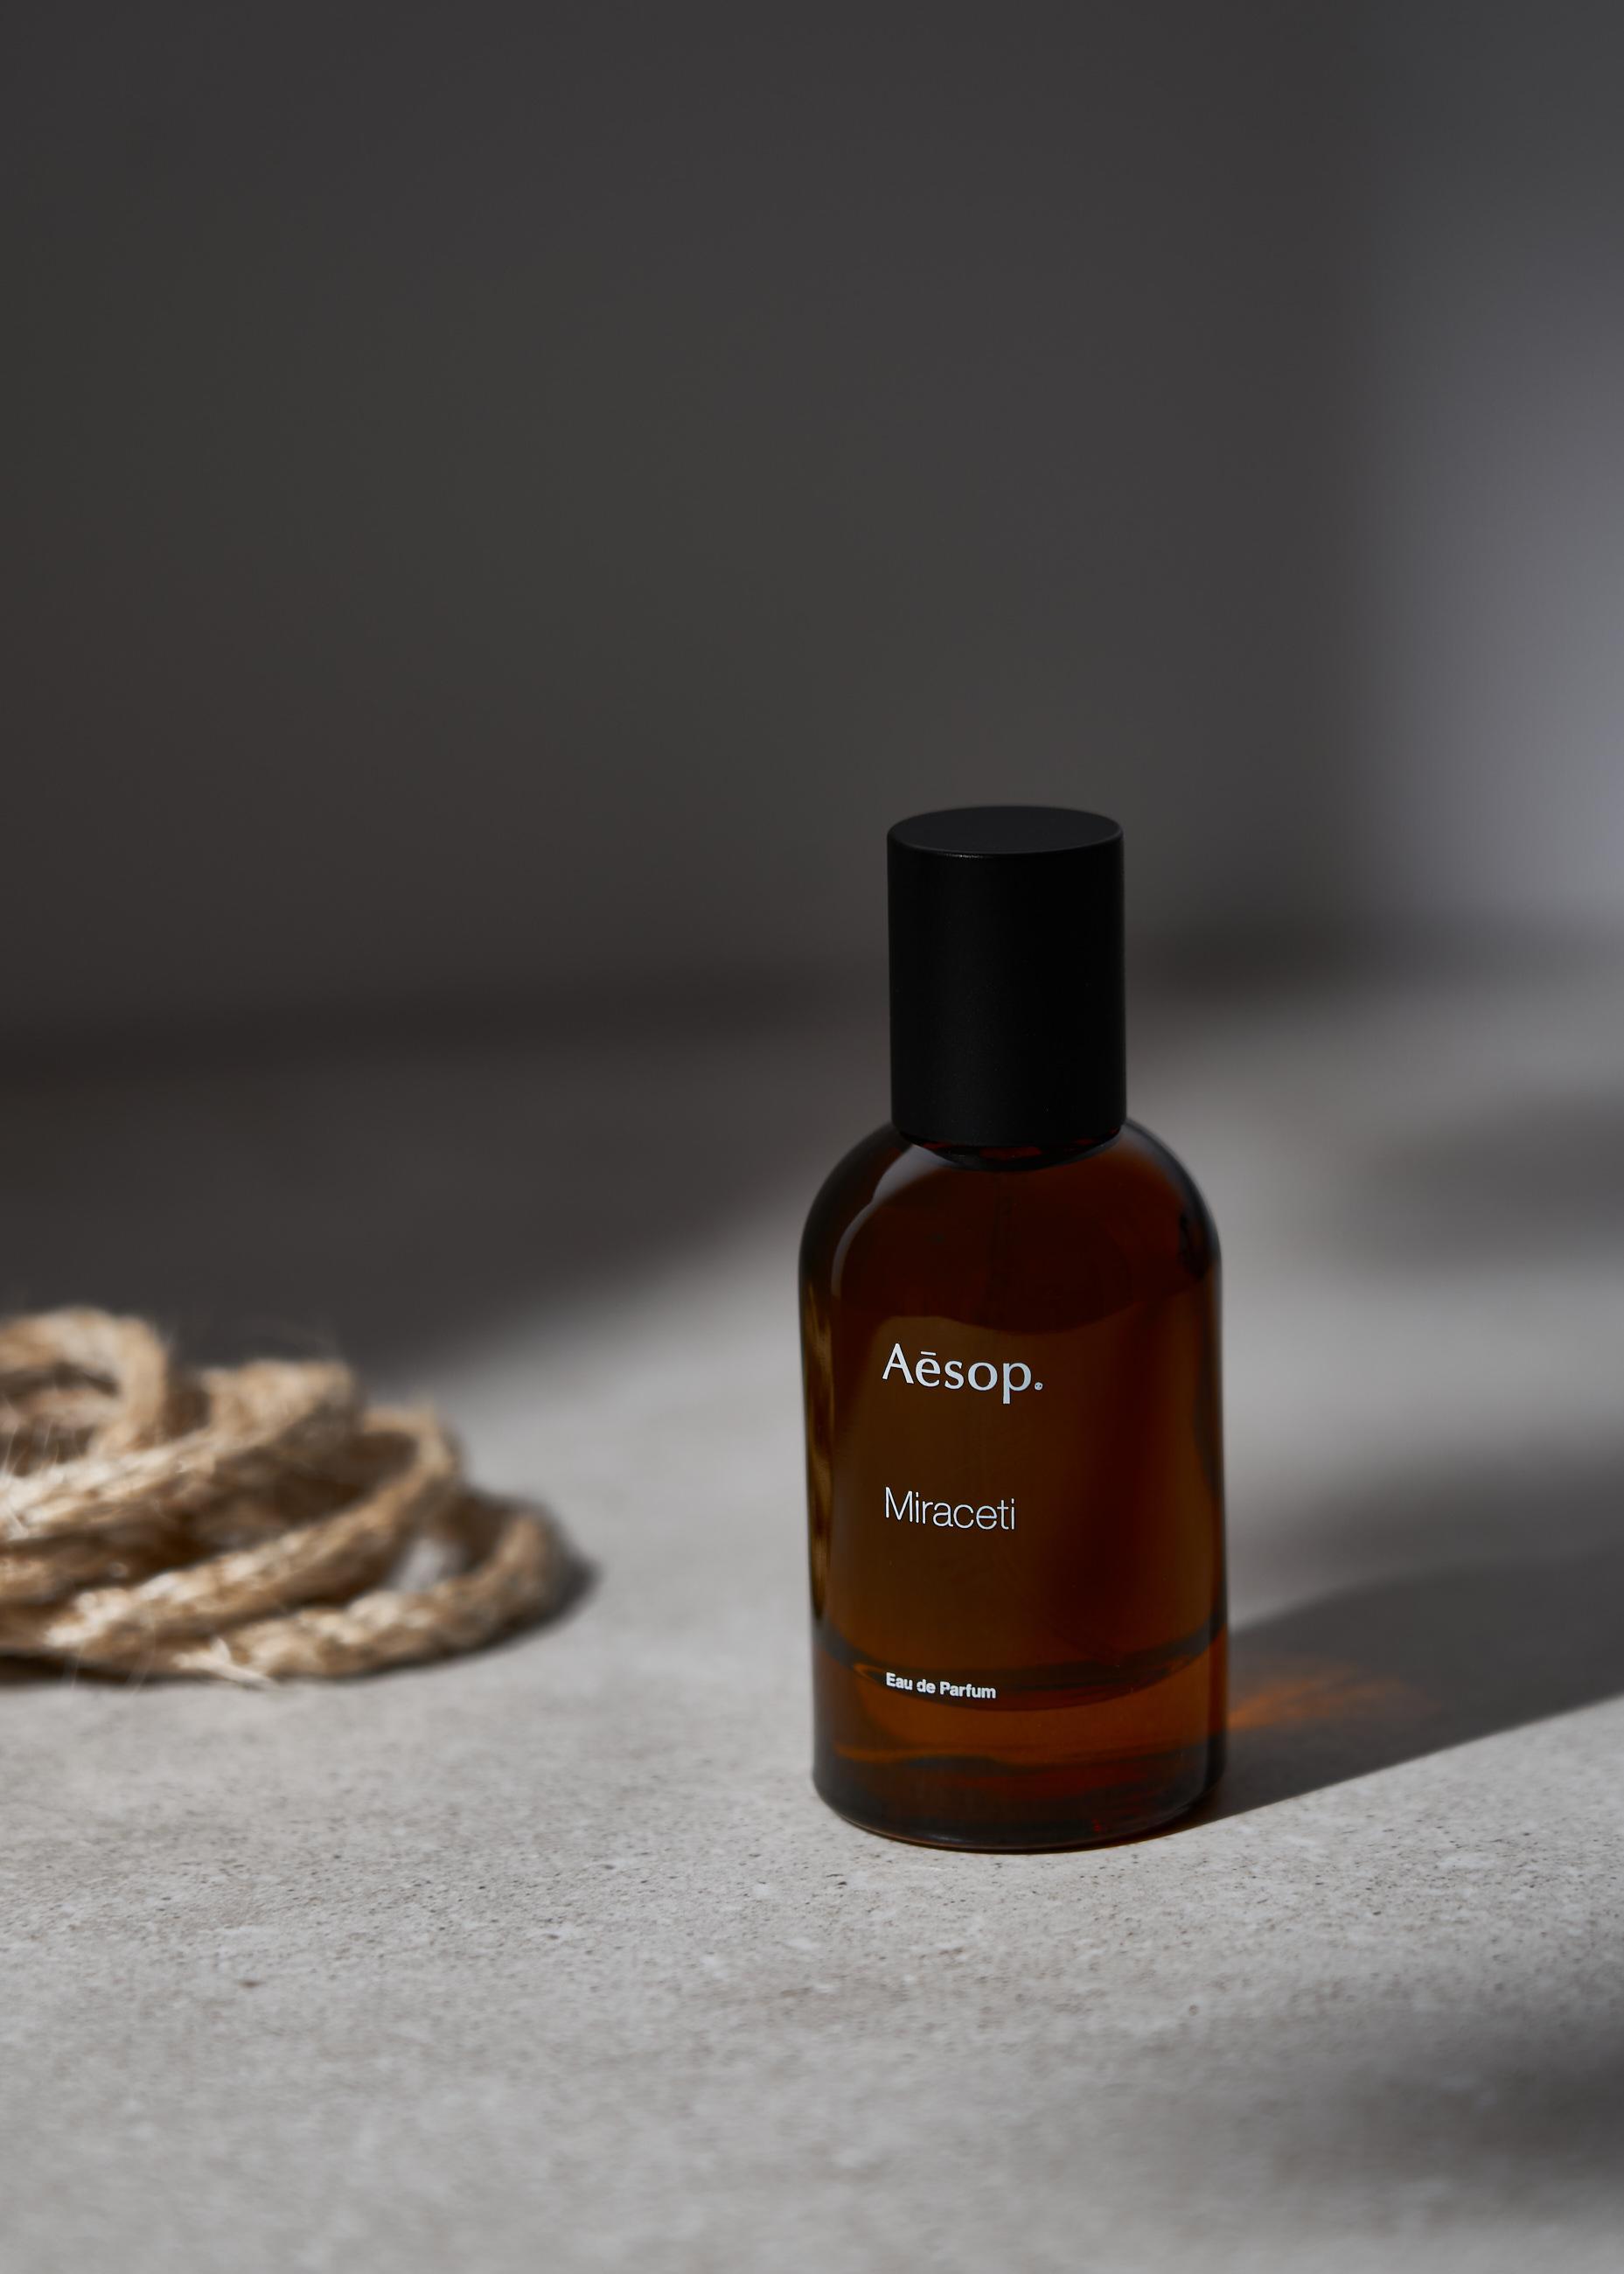 New Aesop Fragrances - Othertopias - Miraceti